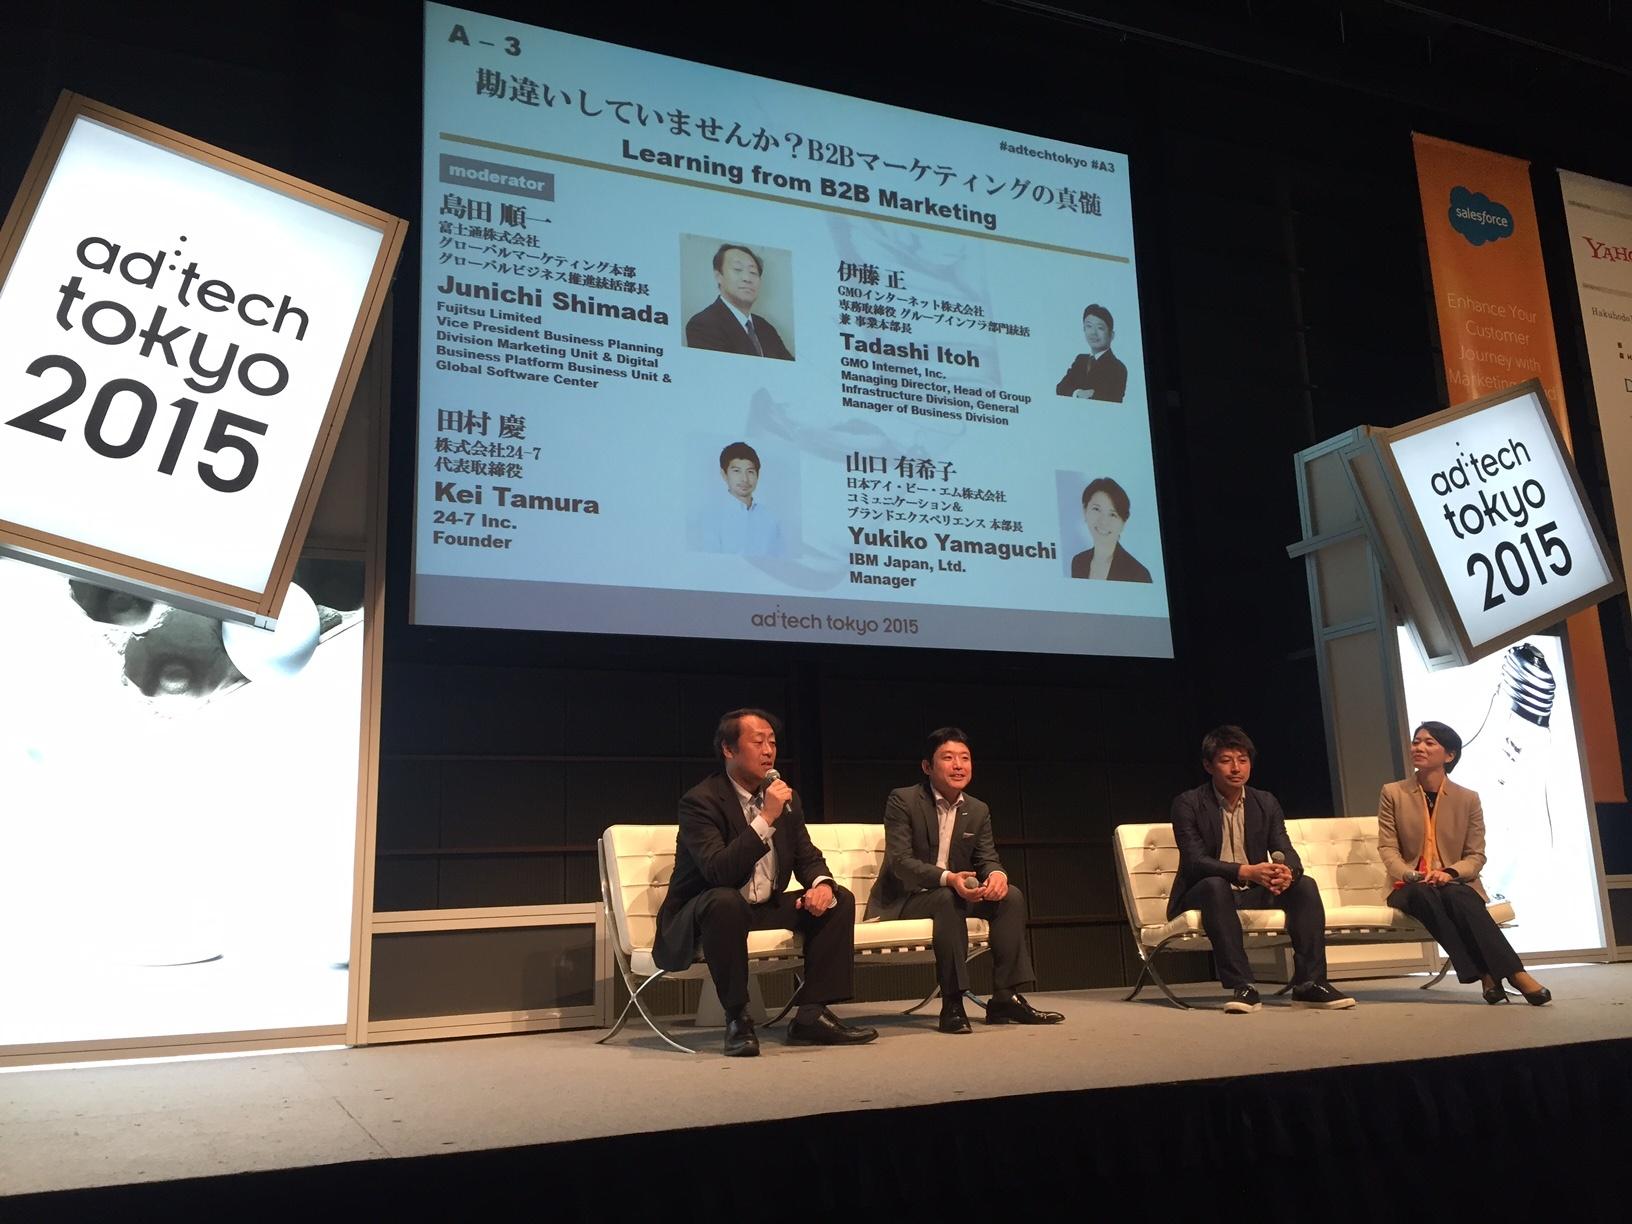 adtech Tokyo2015のカンファレンスに登壇しました!